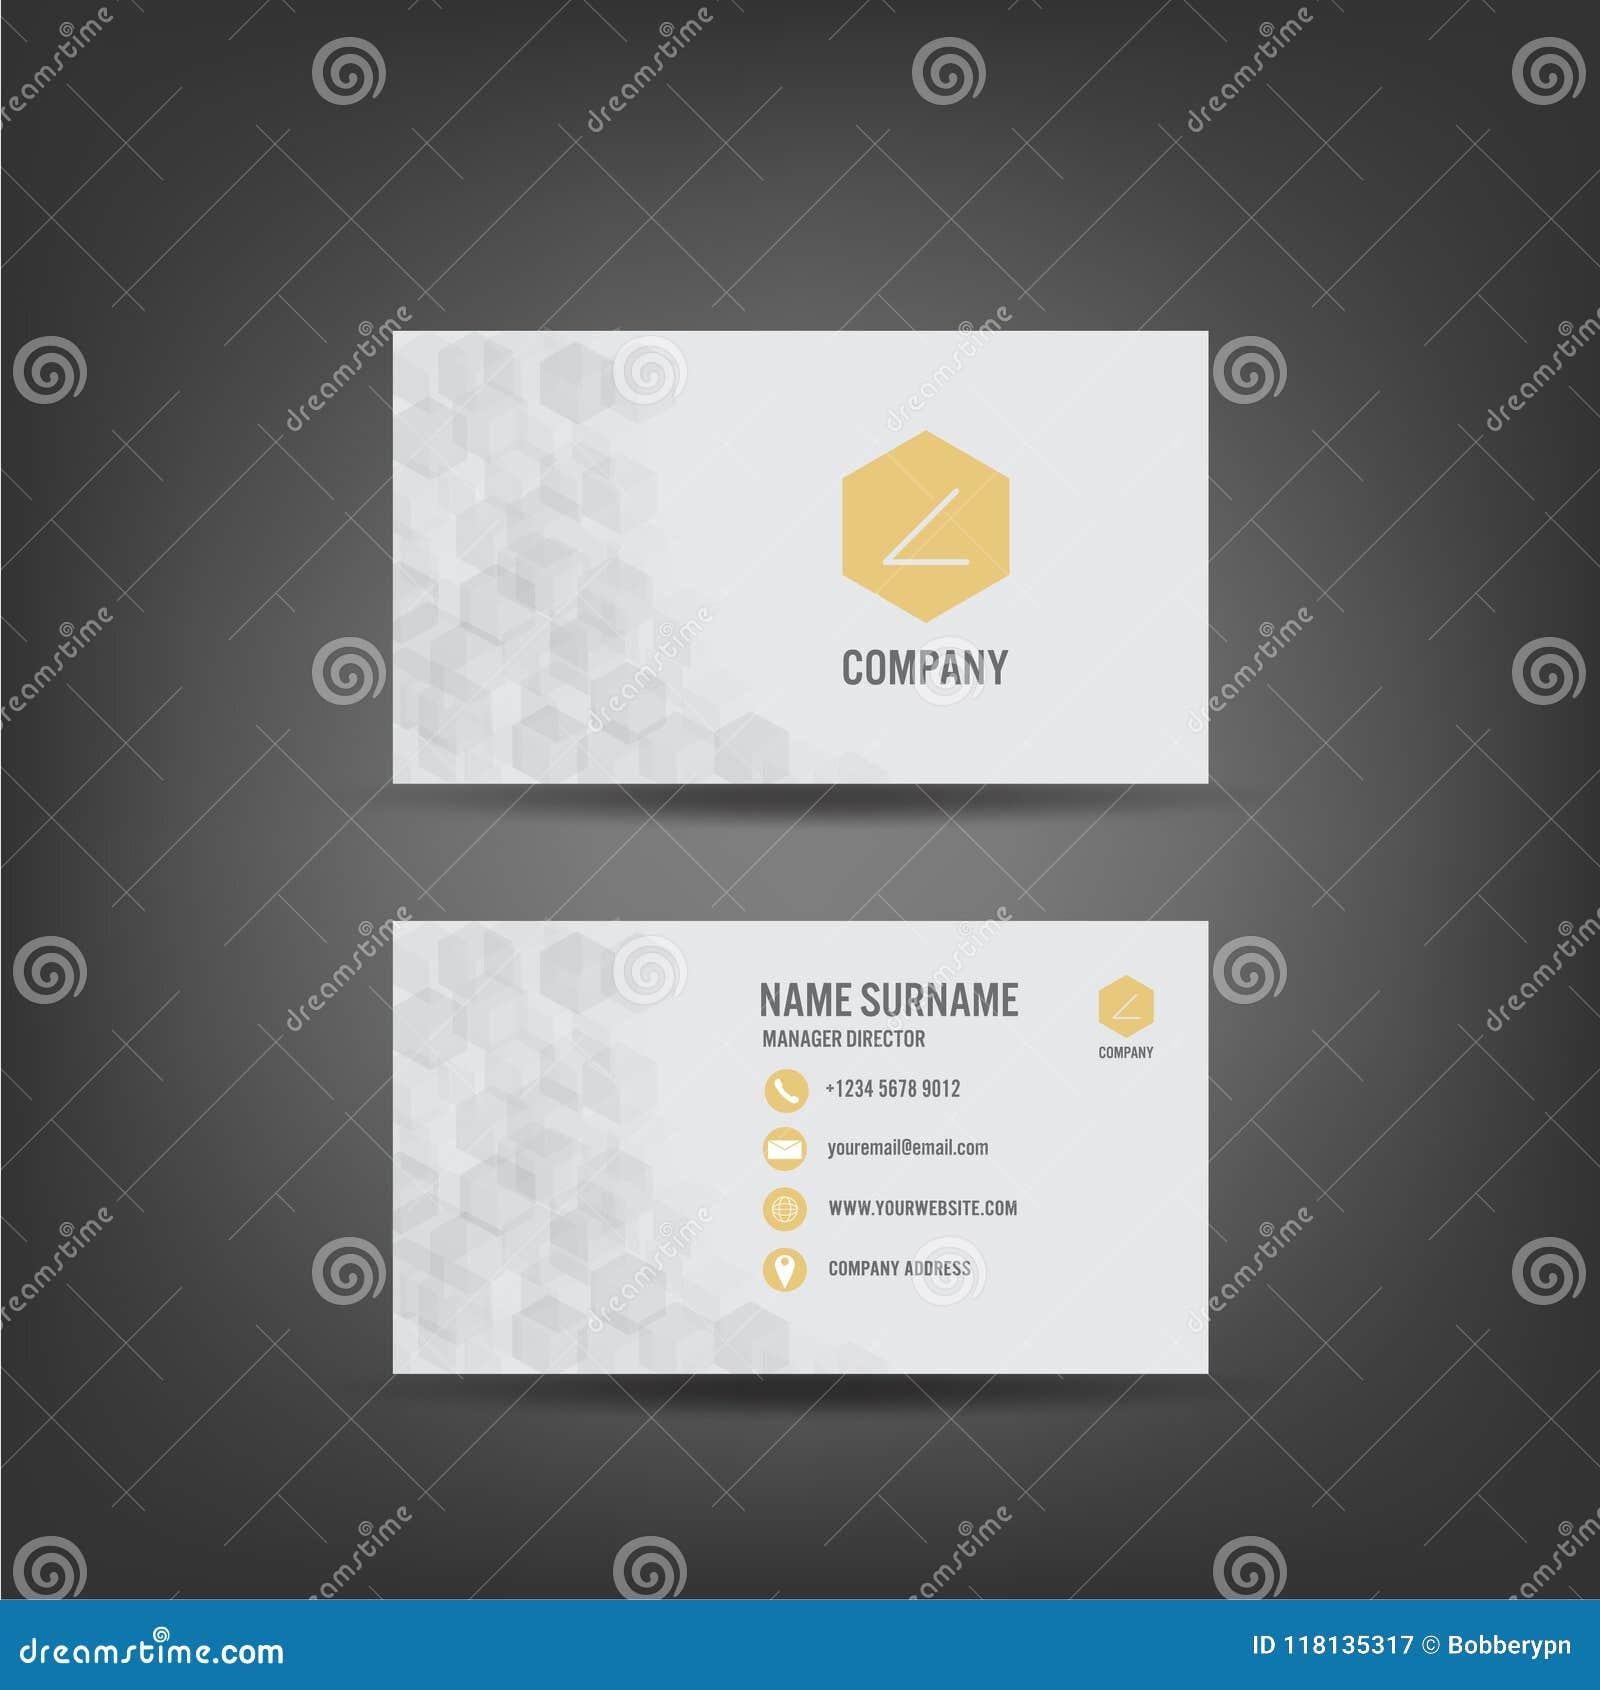 modern simple business card template flat user interface v modern simple business card template flat user interface 118135317